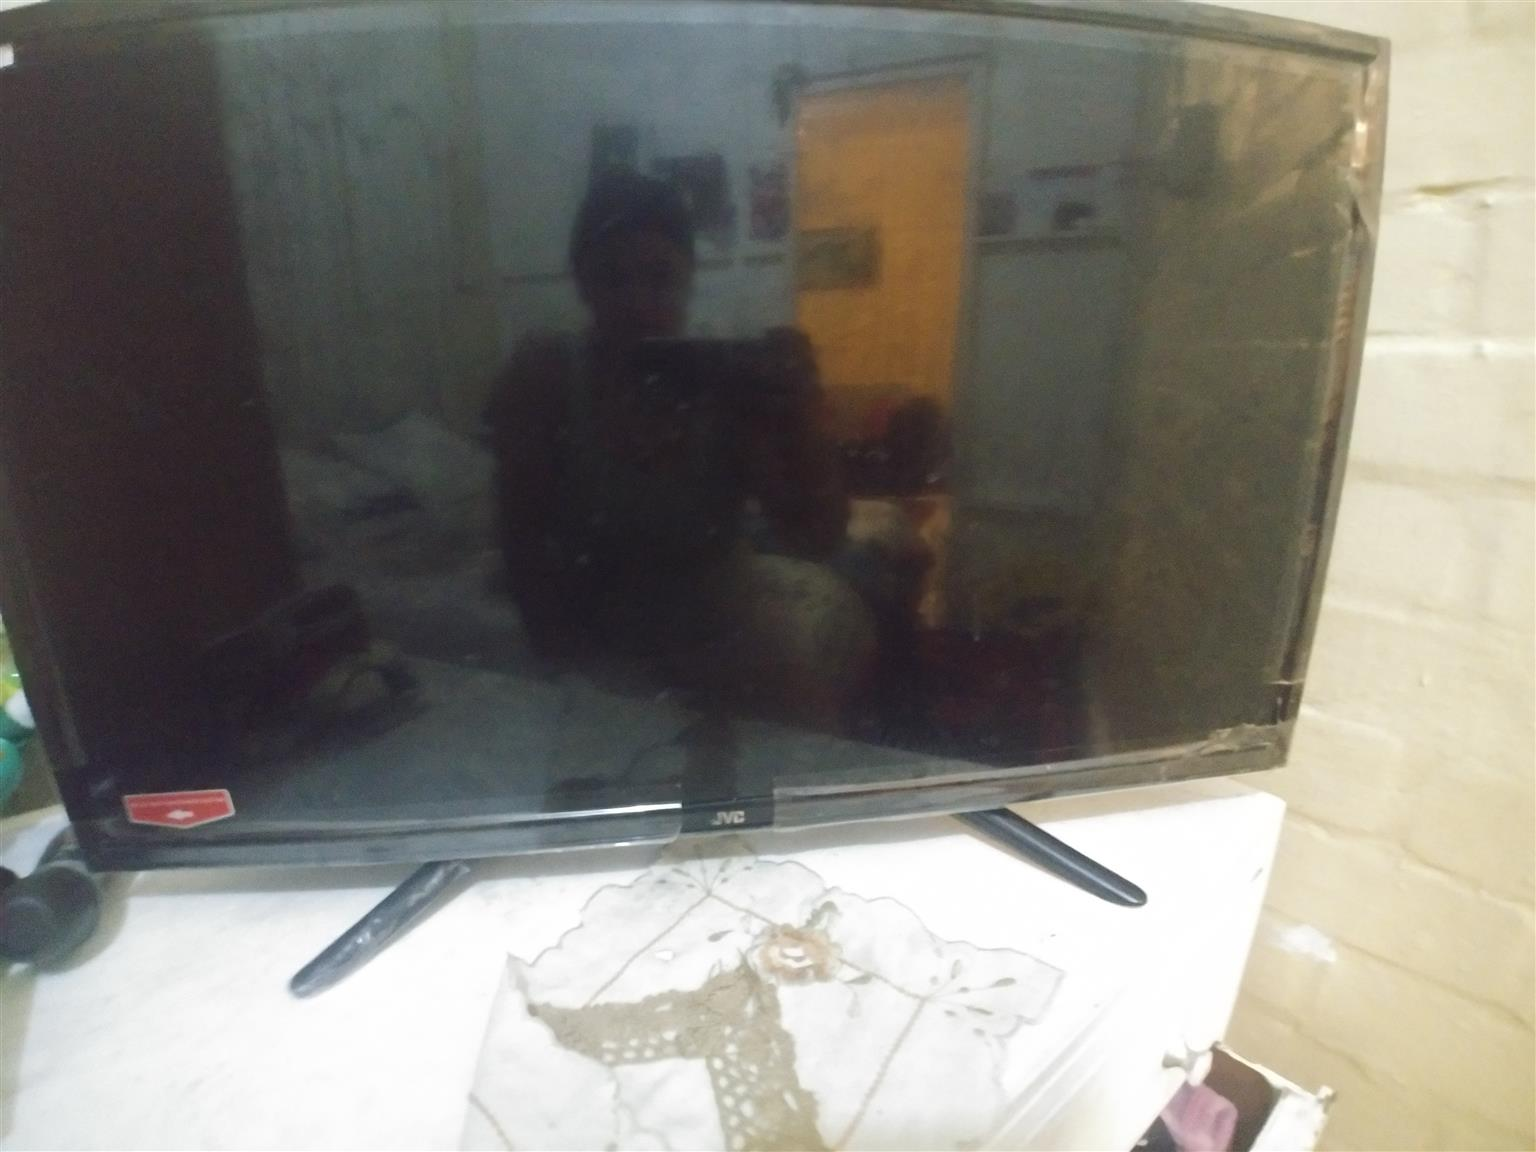 Jvc smart tv lcd broken